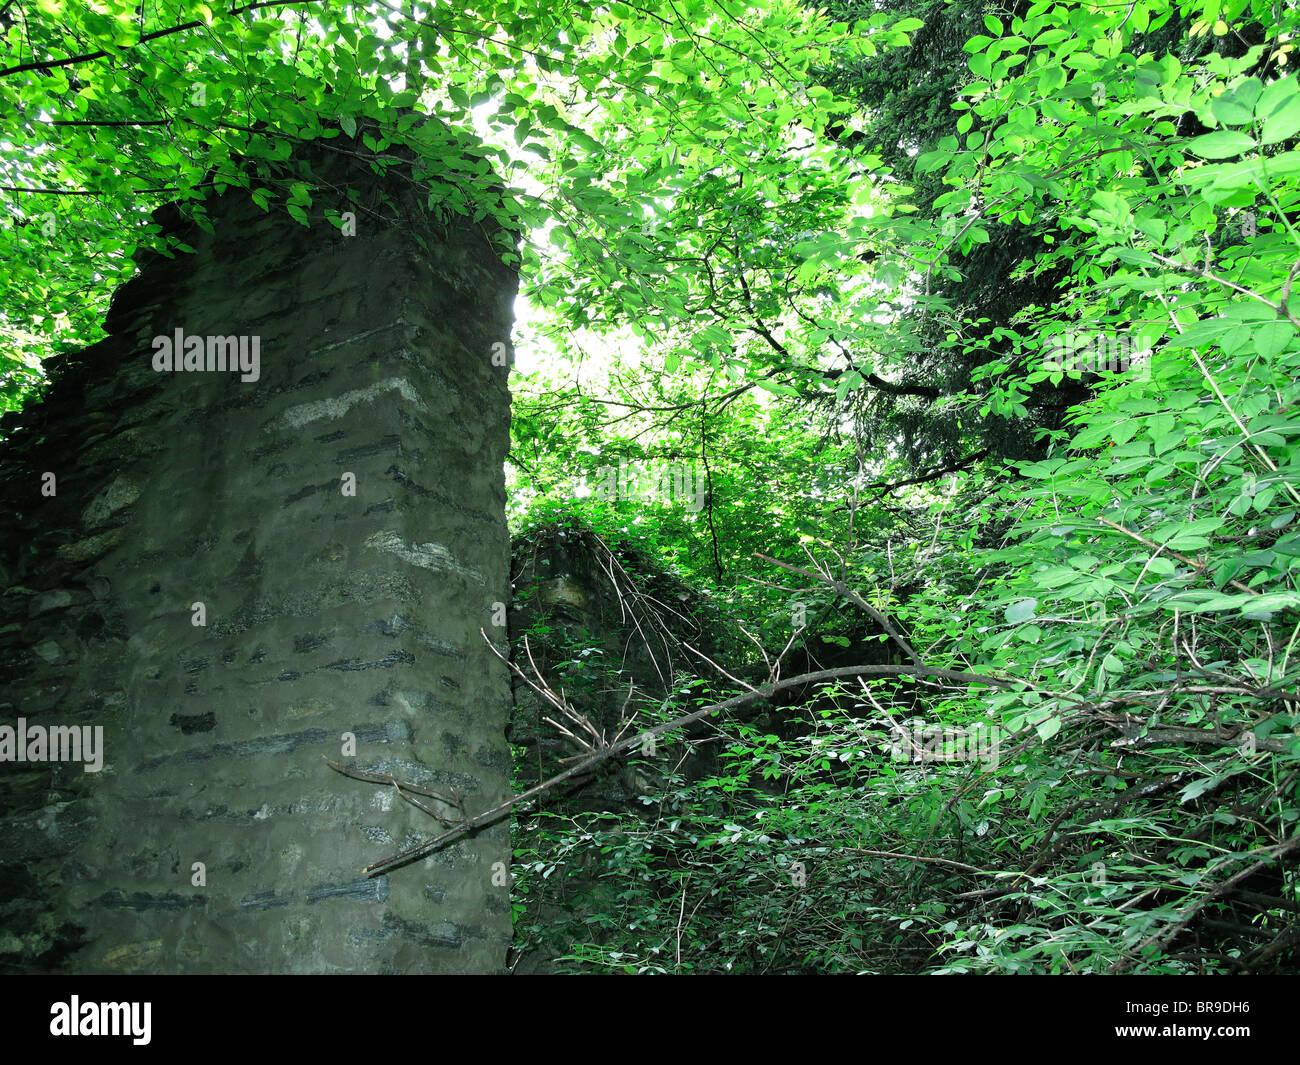 ruins of dwelling house - lush vegetation after rain shower (near village of ascona) - canton of ticino - switzerland - Stock Image